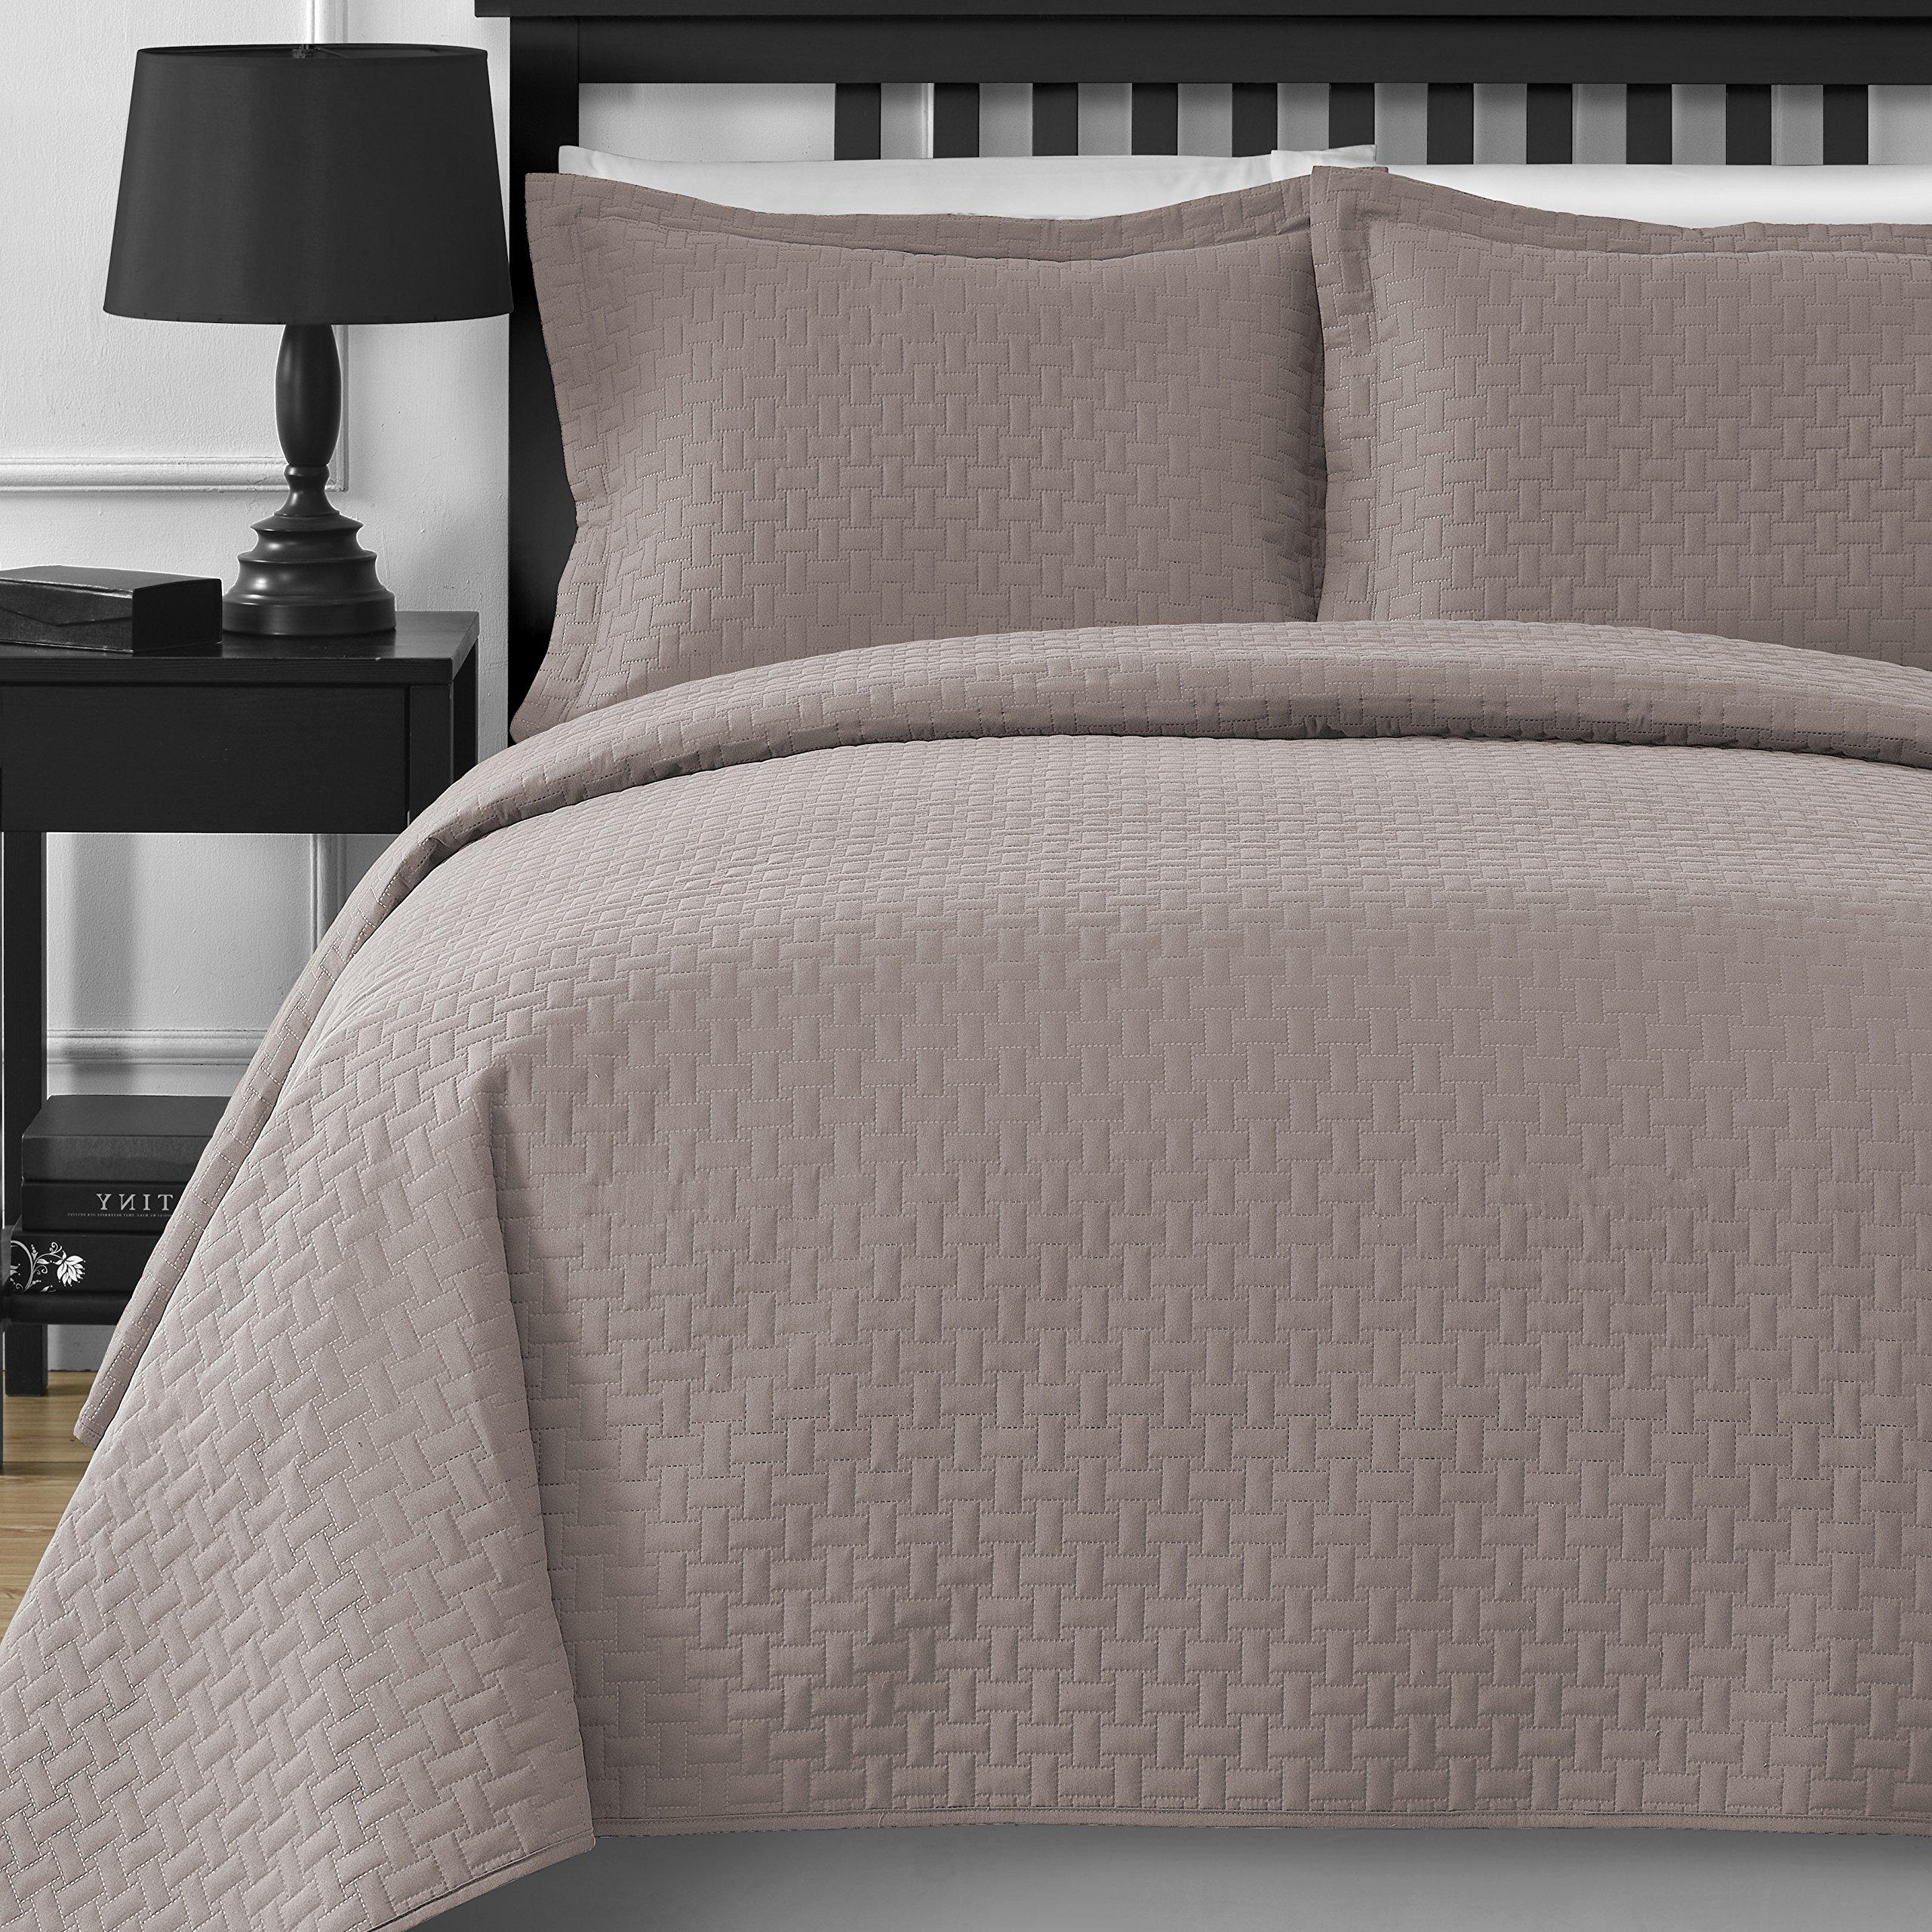 Extra Lightweight Comfy Bedding Frame 3-piece Bedspread Coverlet Set (King/Cal King, Khaki)